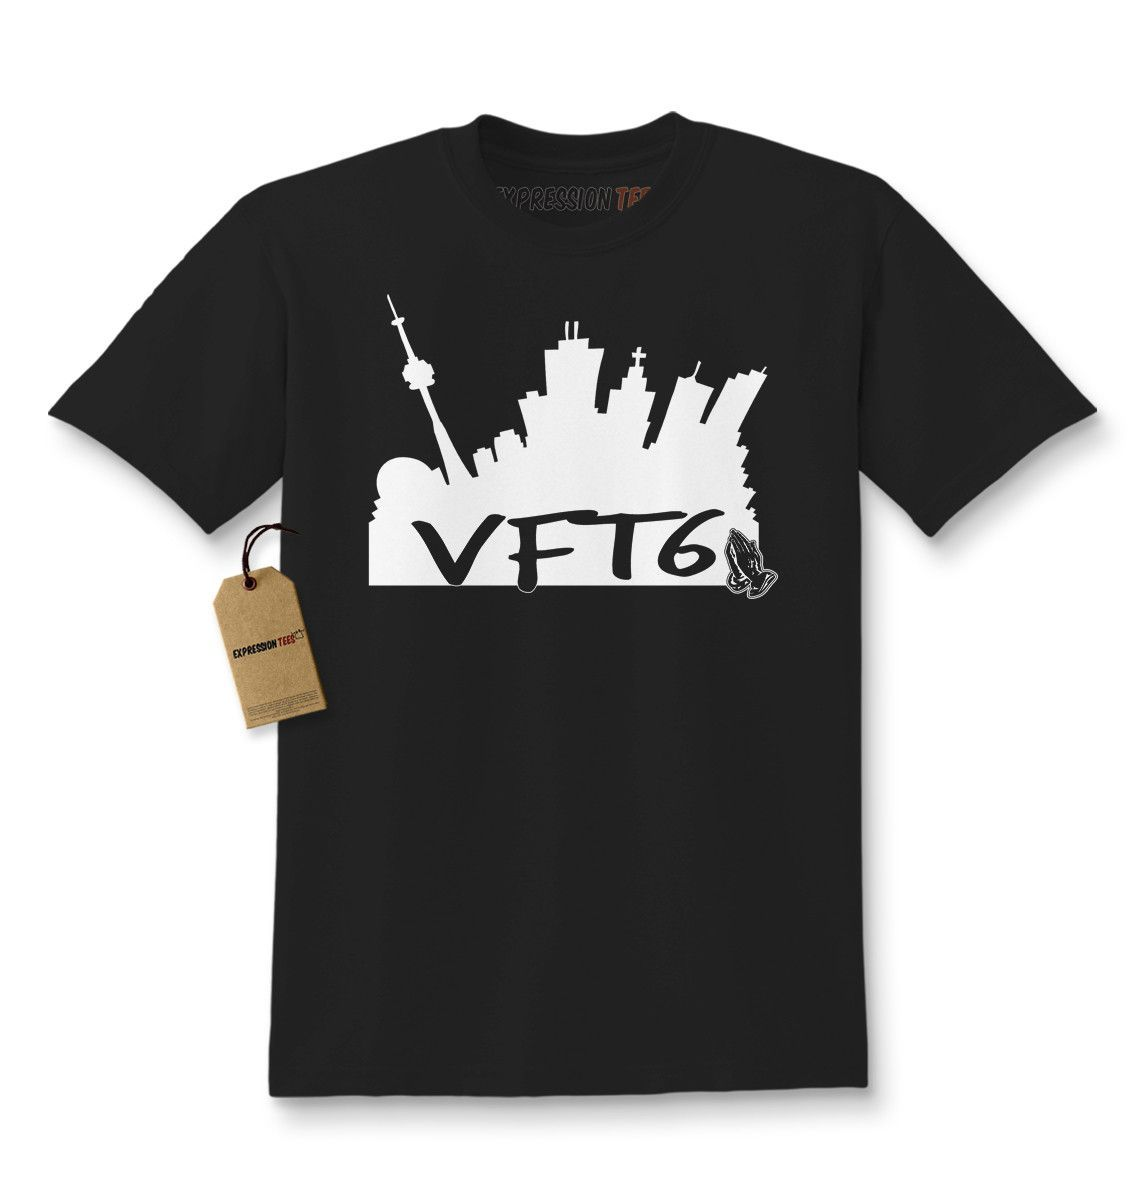 VFT6 Toronto Skyline Kids T-shirt